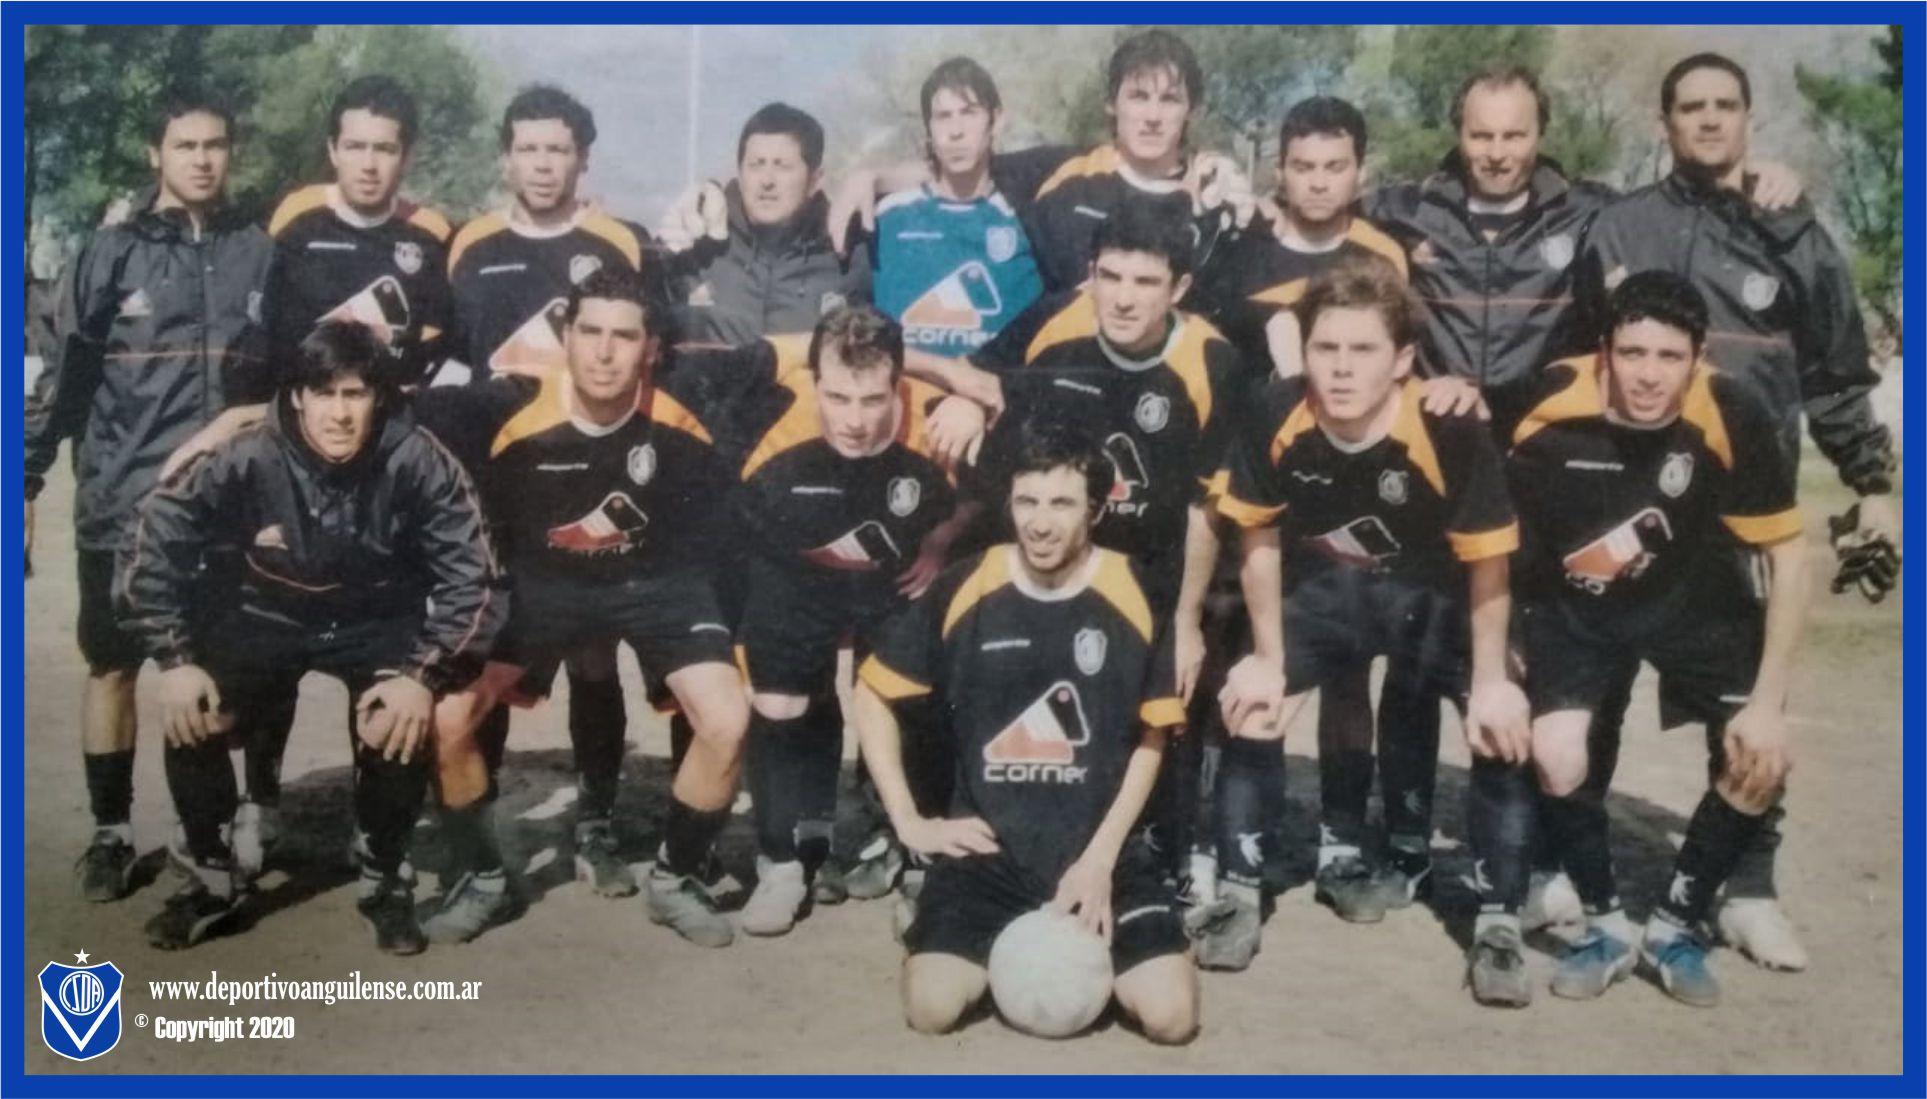 Anguilense 2007 Camiseta Negra